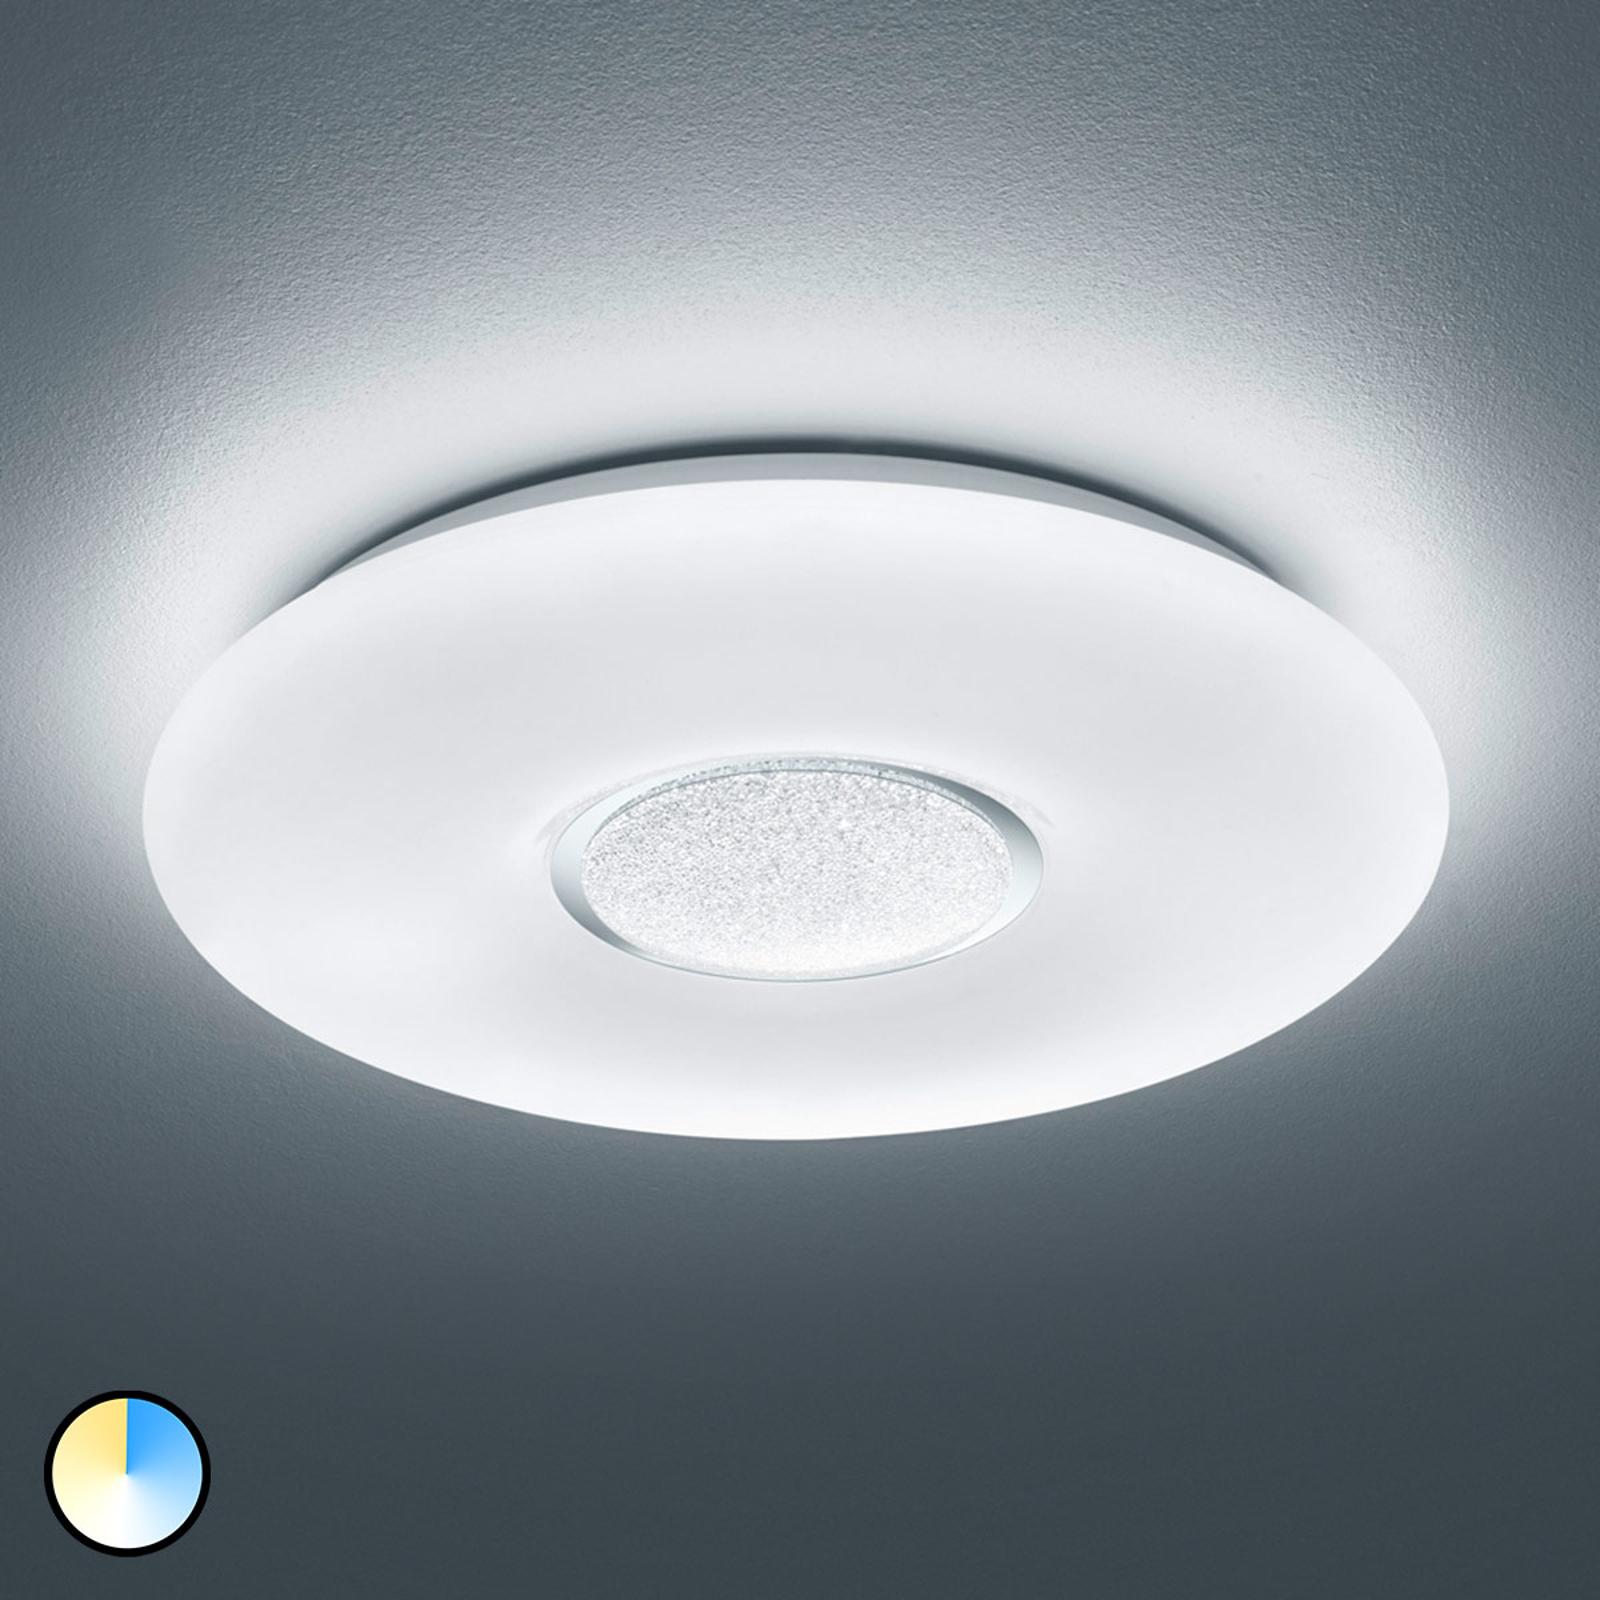 Lampa sufitowa LED Akina z pilotem